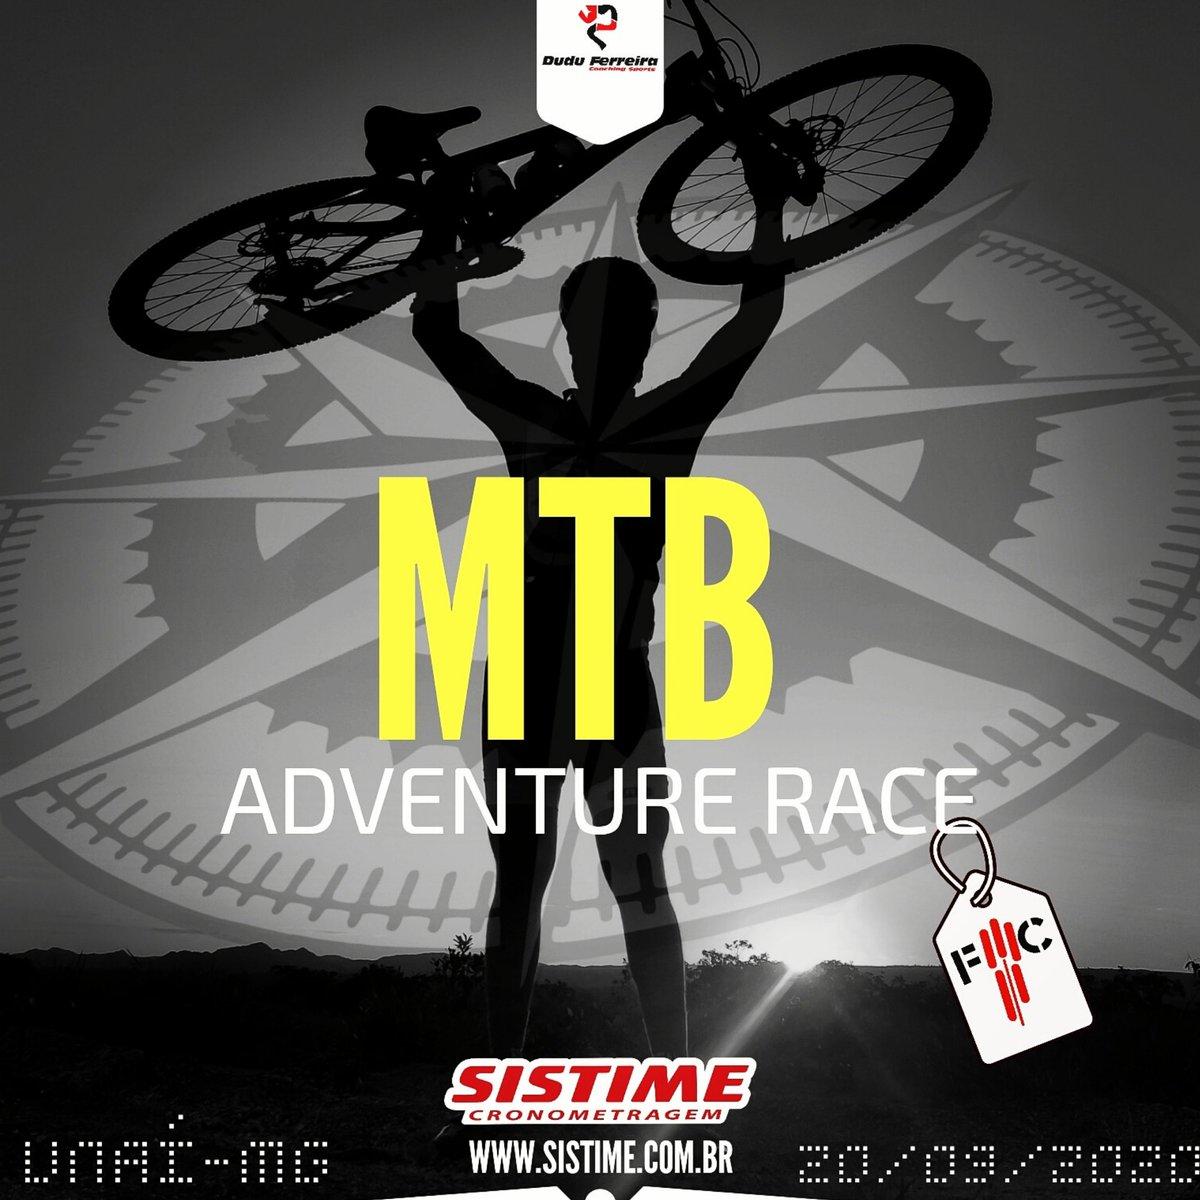 Inscrições abertas para essa prova top que agitará a cidade de Unaí . #mtb #xcm #unai #unaimtb #ciclismo #bikenafoto #duduferreiracoachingsports #montainbike #mtbadventure #mtbbrasil #pedal #pedalar #mtblife #ciclismo #bike #instabike #trilha #cyclinglife #cervejariabigmustachepic.twitter.com/vXbIVCsDnh